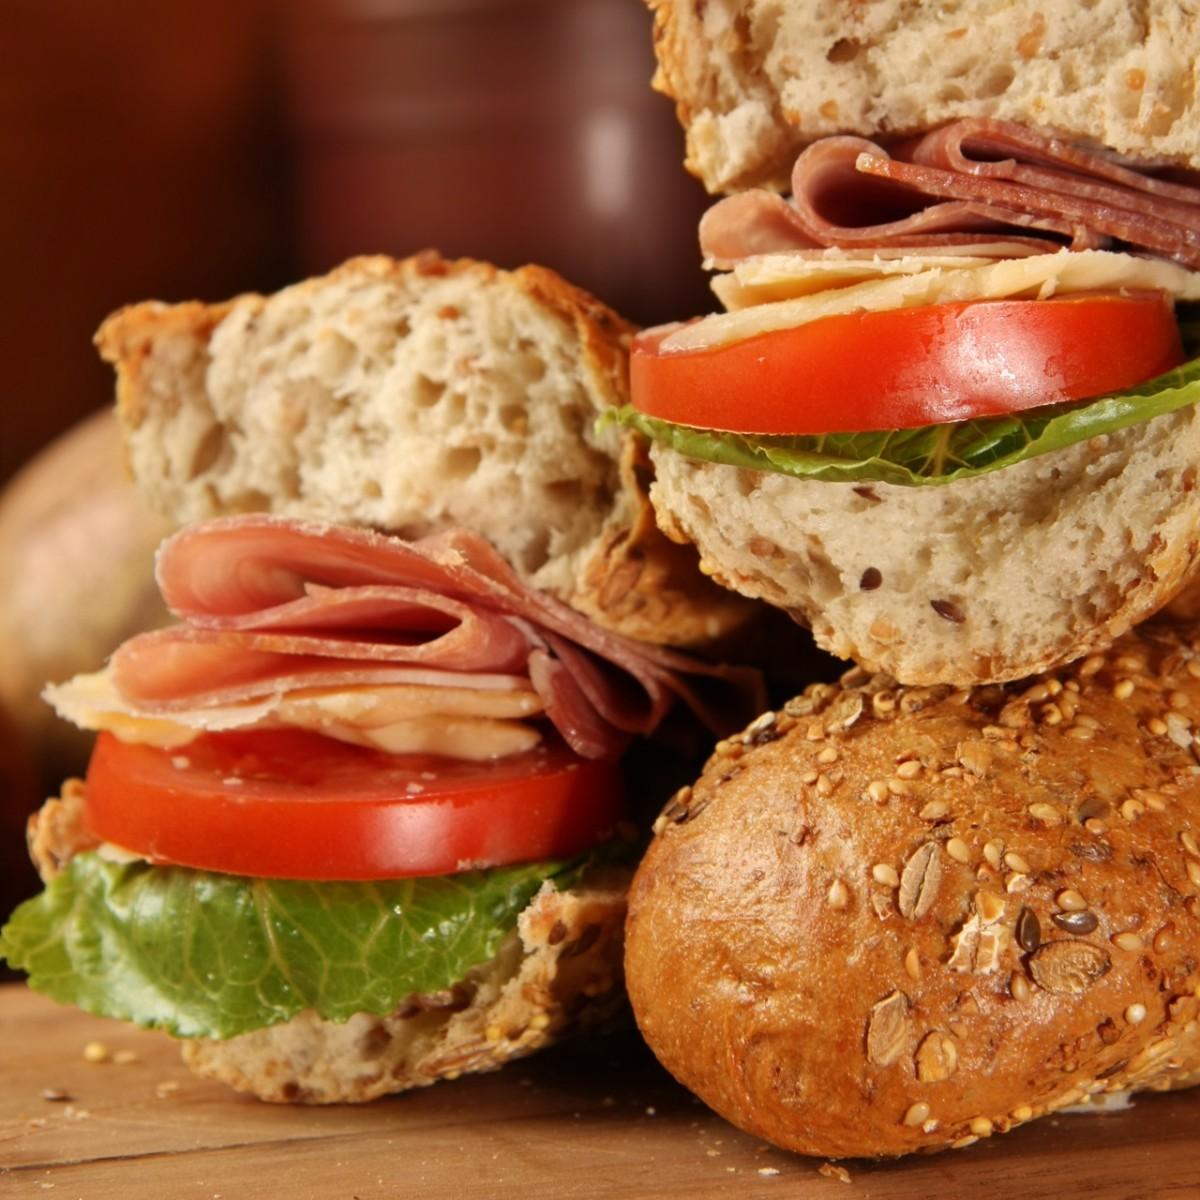 75 Catchy Sandwich Shop Names | ToughNickel